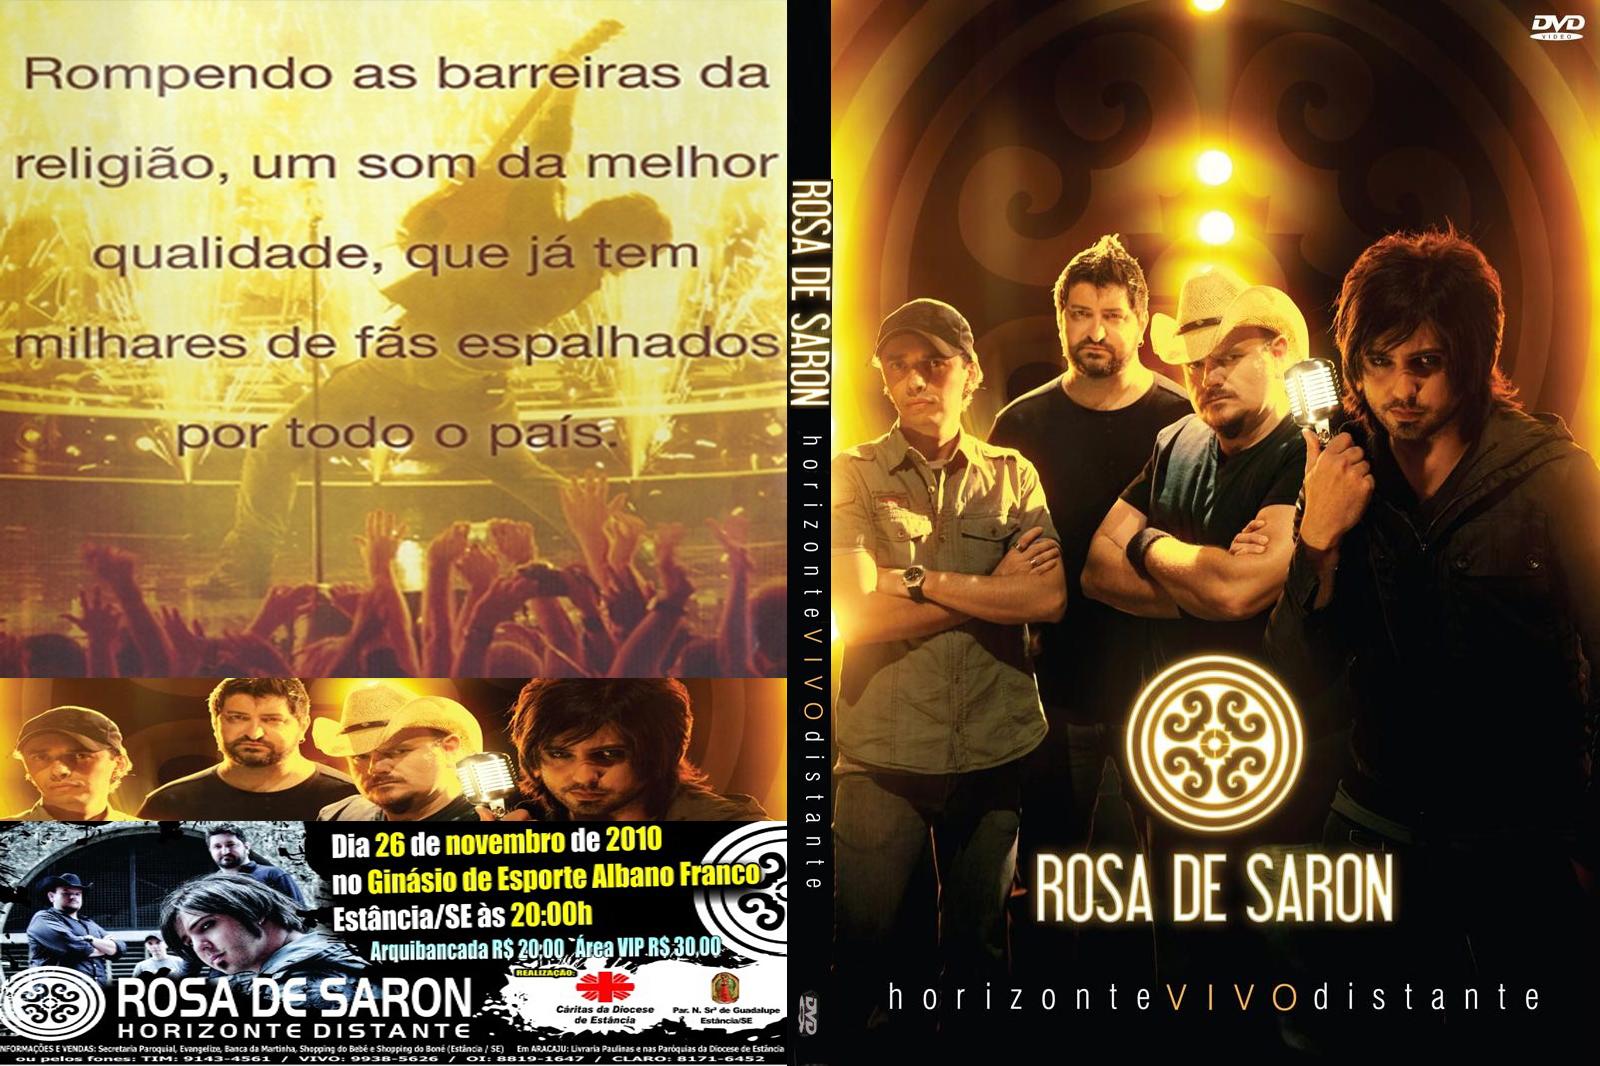 +VIVO+Distante+Rosa+de+Saron Horizonte+VIVO+Distante+Rosa+de+Saron